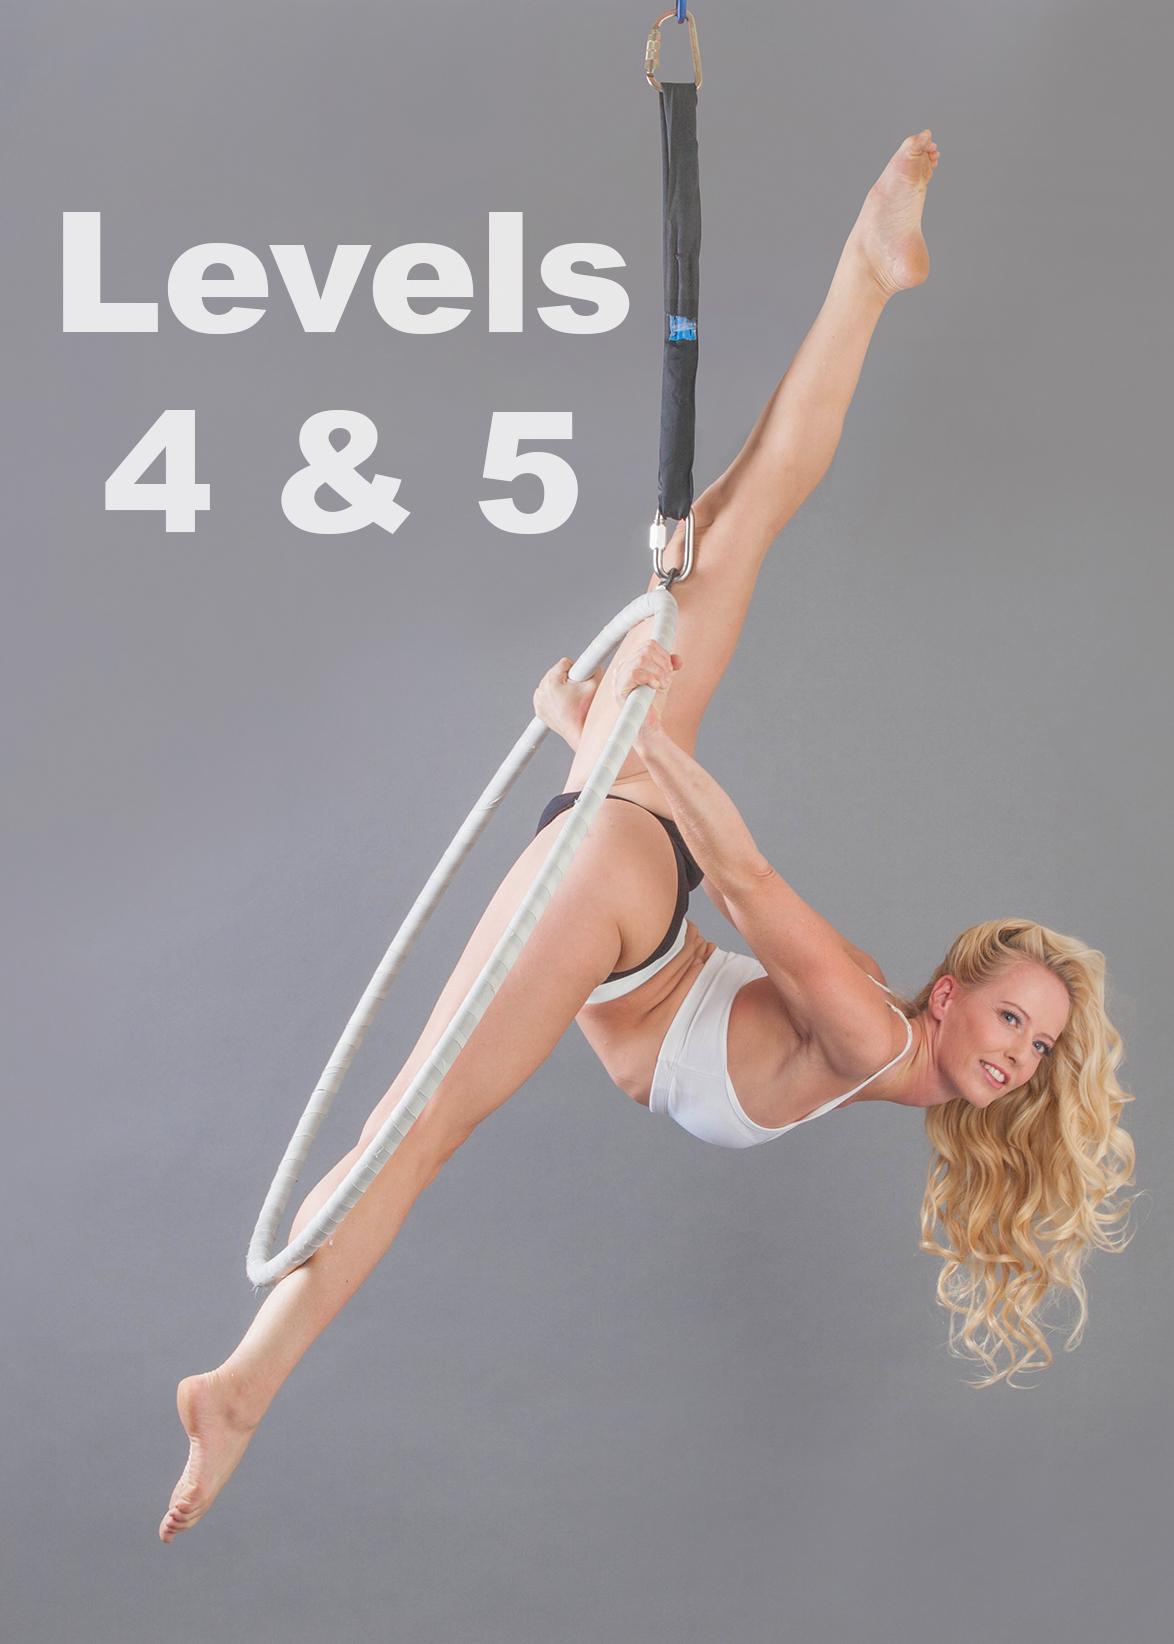 Hoop Level 4and5.jpg